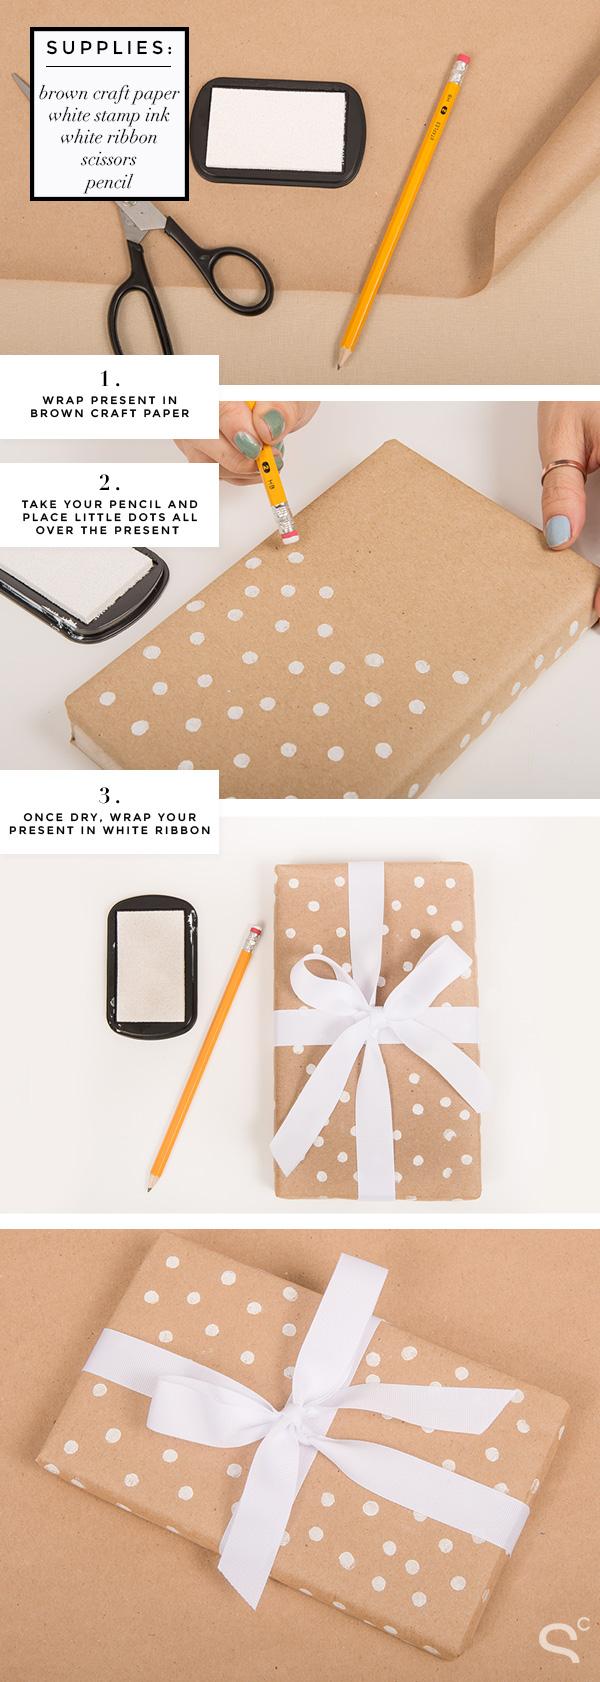 DIY-Gift-Wrapping-Ideas-Polka-Dot